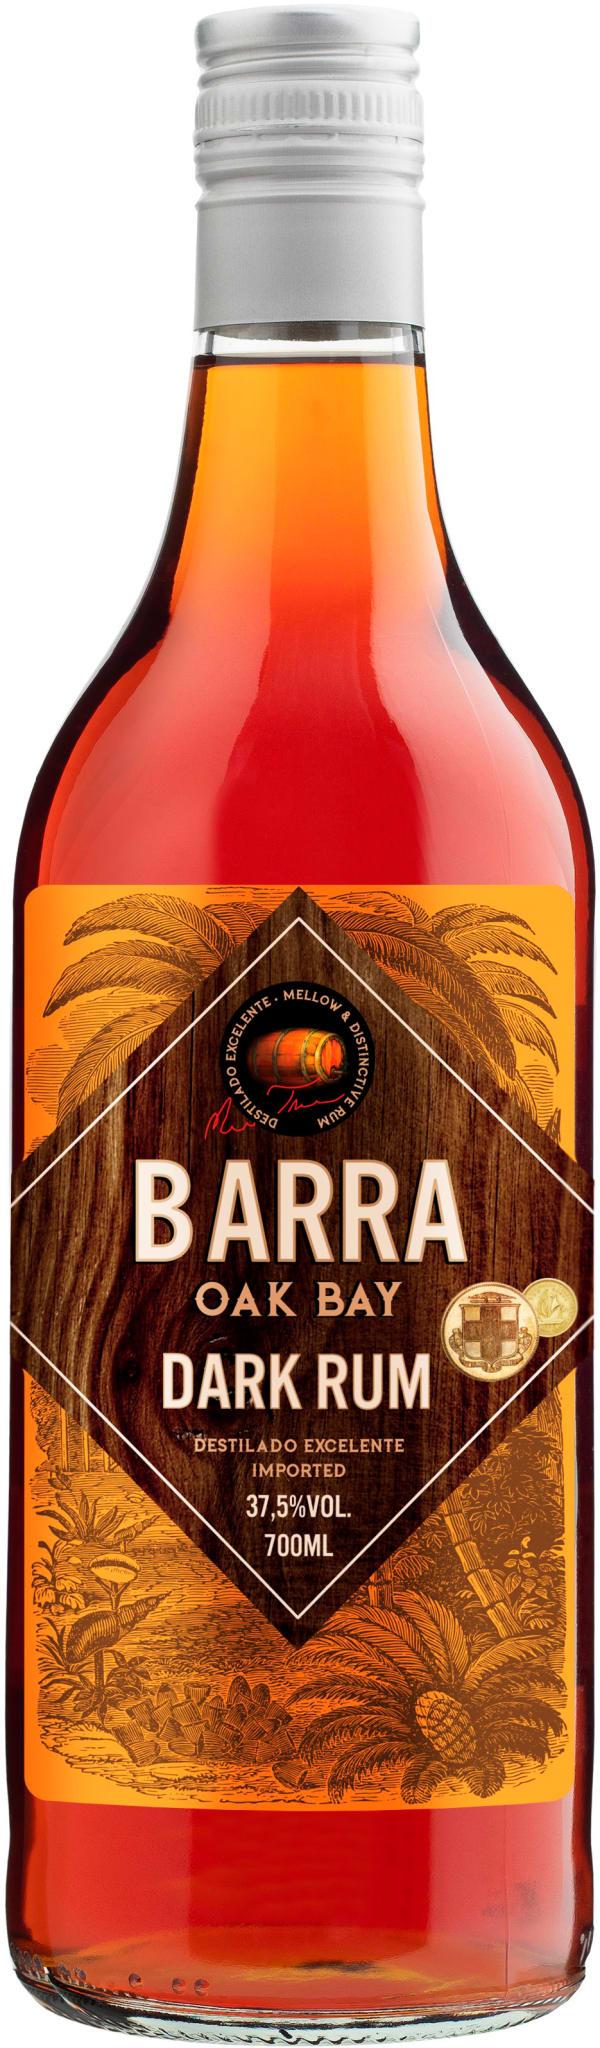 Barra Oak Bay Dark